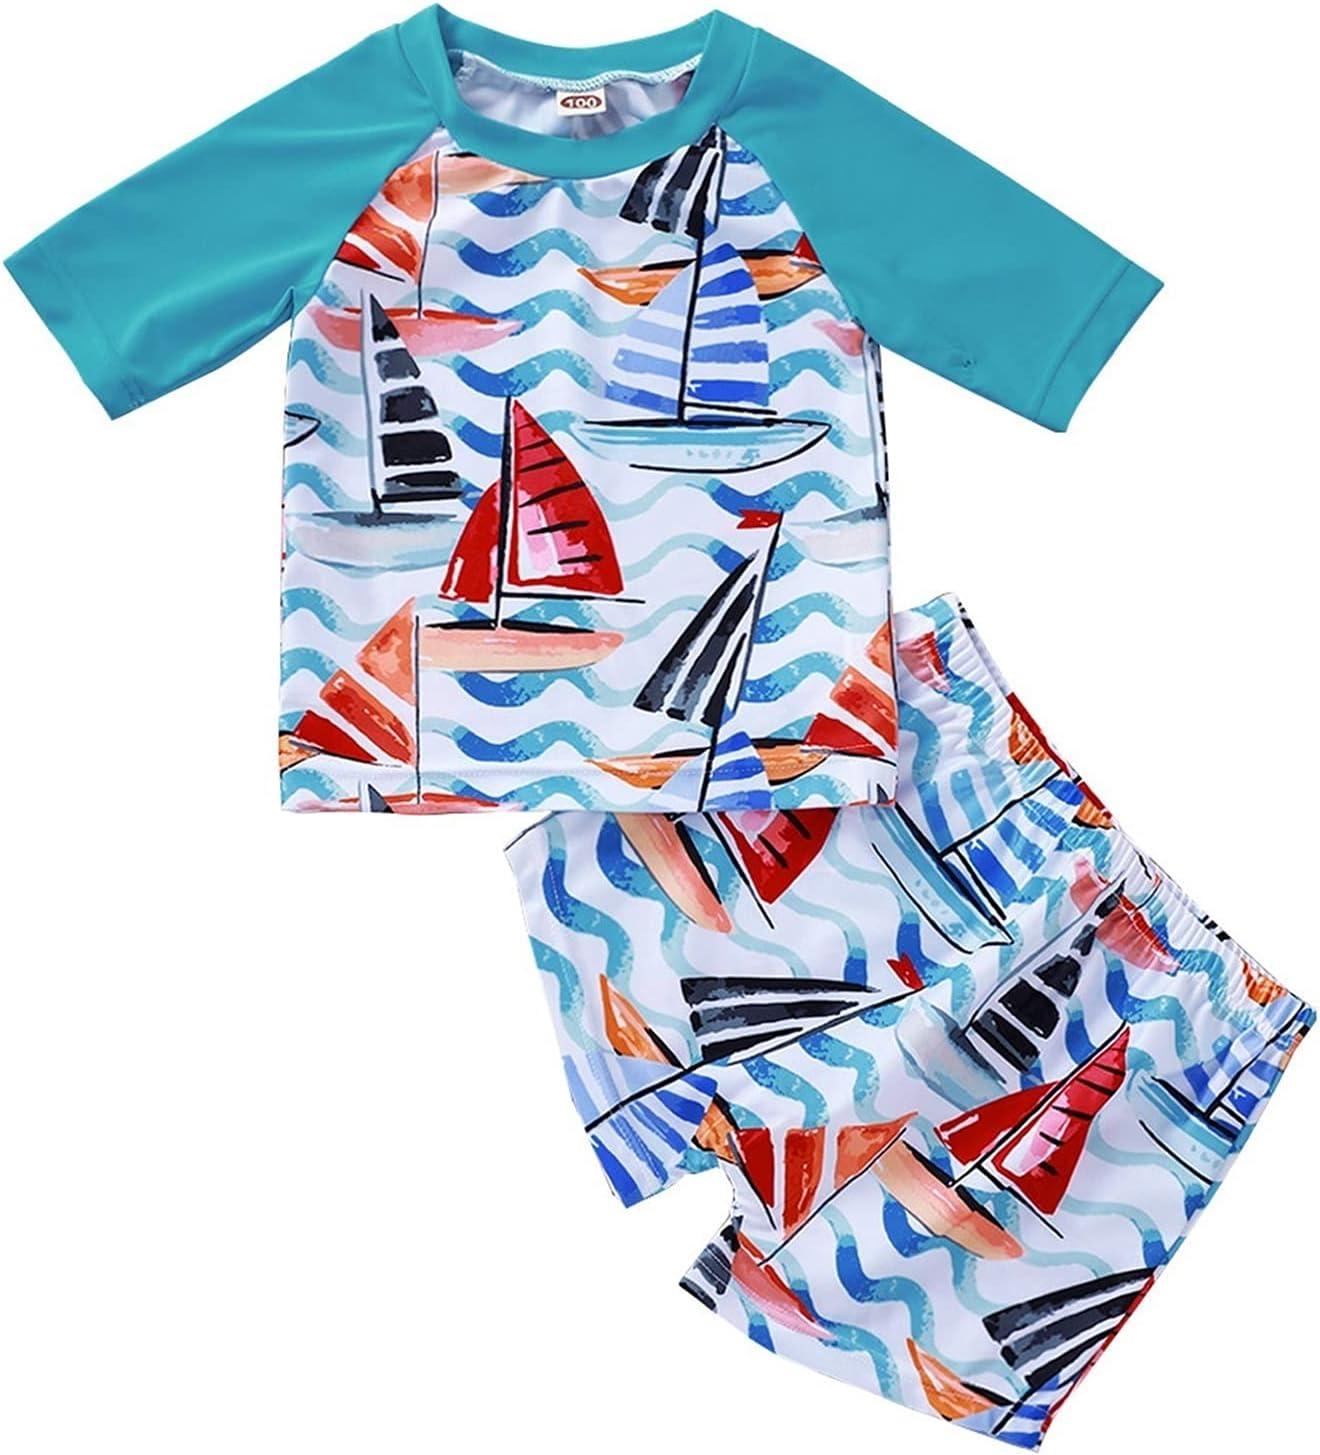 Children Swimwear Toddler Kids B Boys Tops+Short SEAL limited product Letter Ranking TOP9